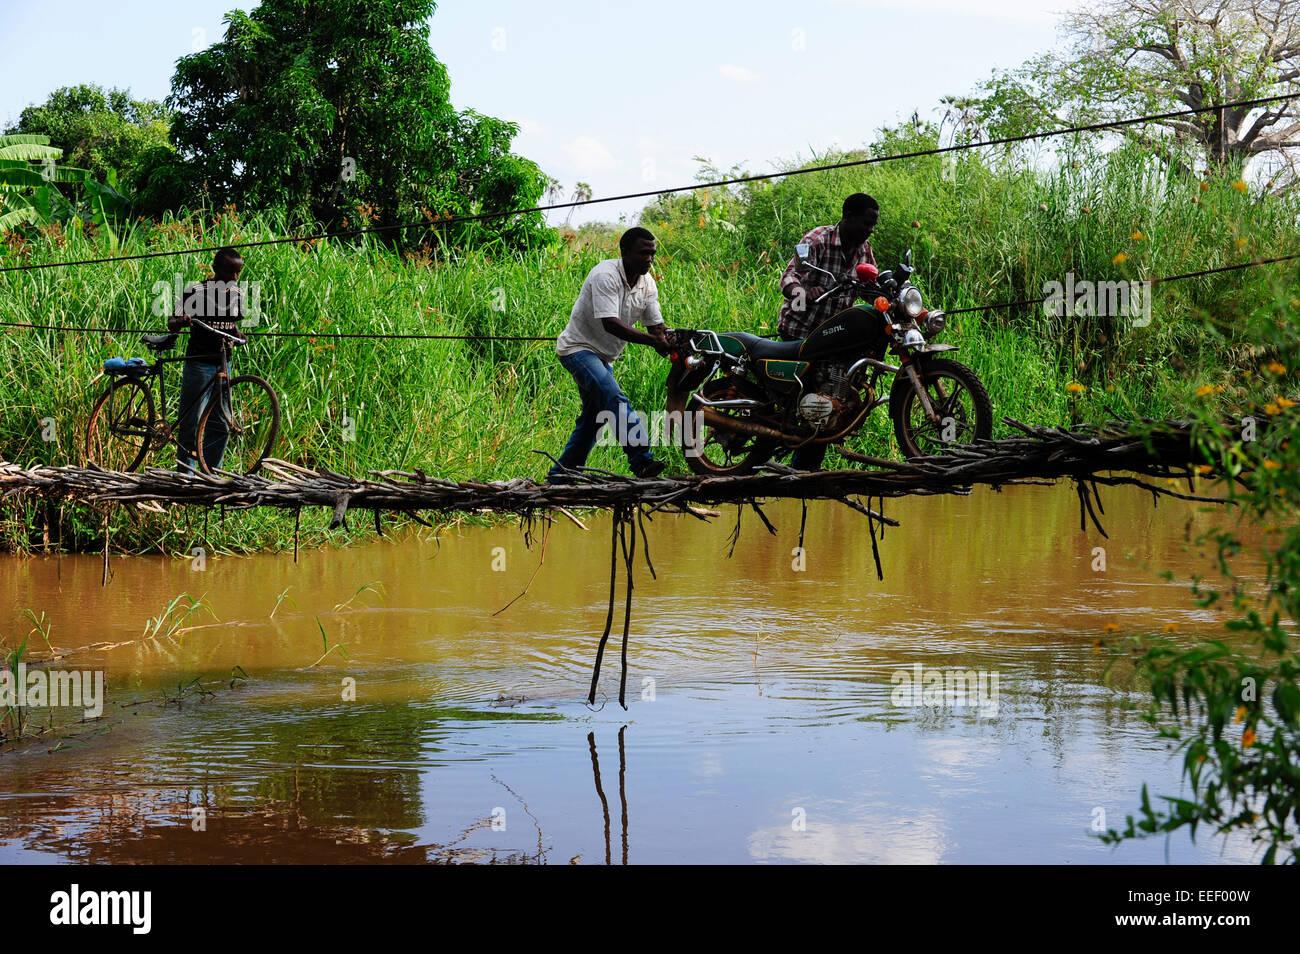 La TANZANIE, Korogwe, pont suspendu dans Kwalukonge / TANZANIE, dans Kwalukonge Haengebruecke, Korogwe Photo Stock